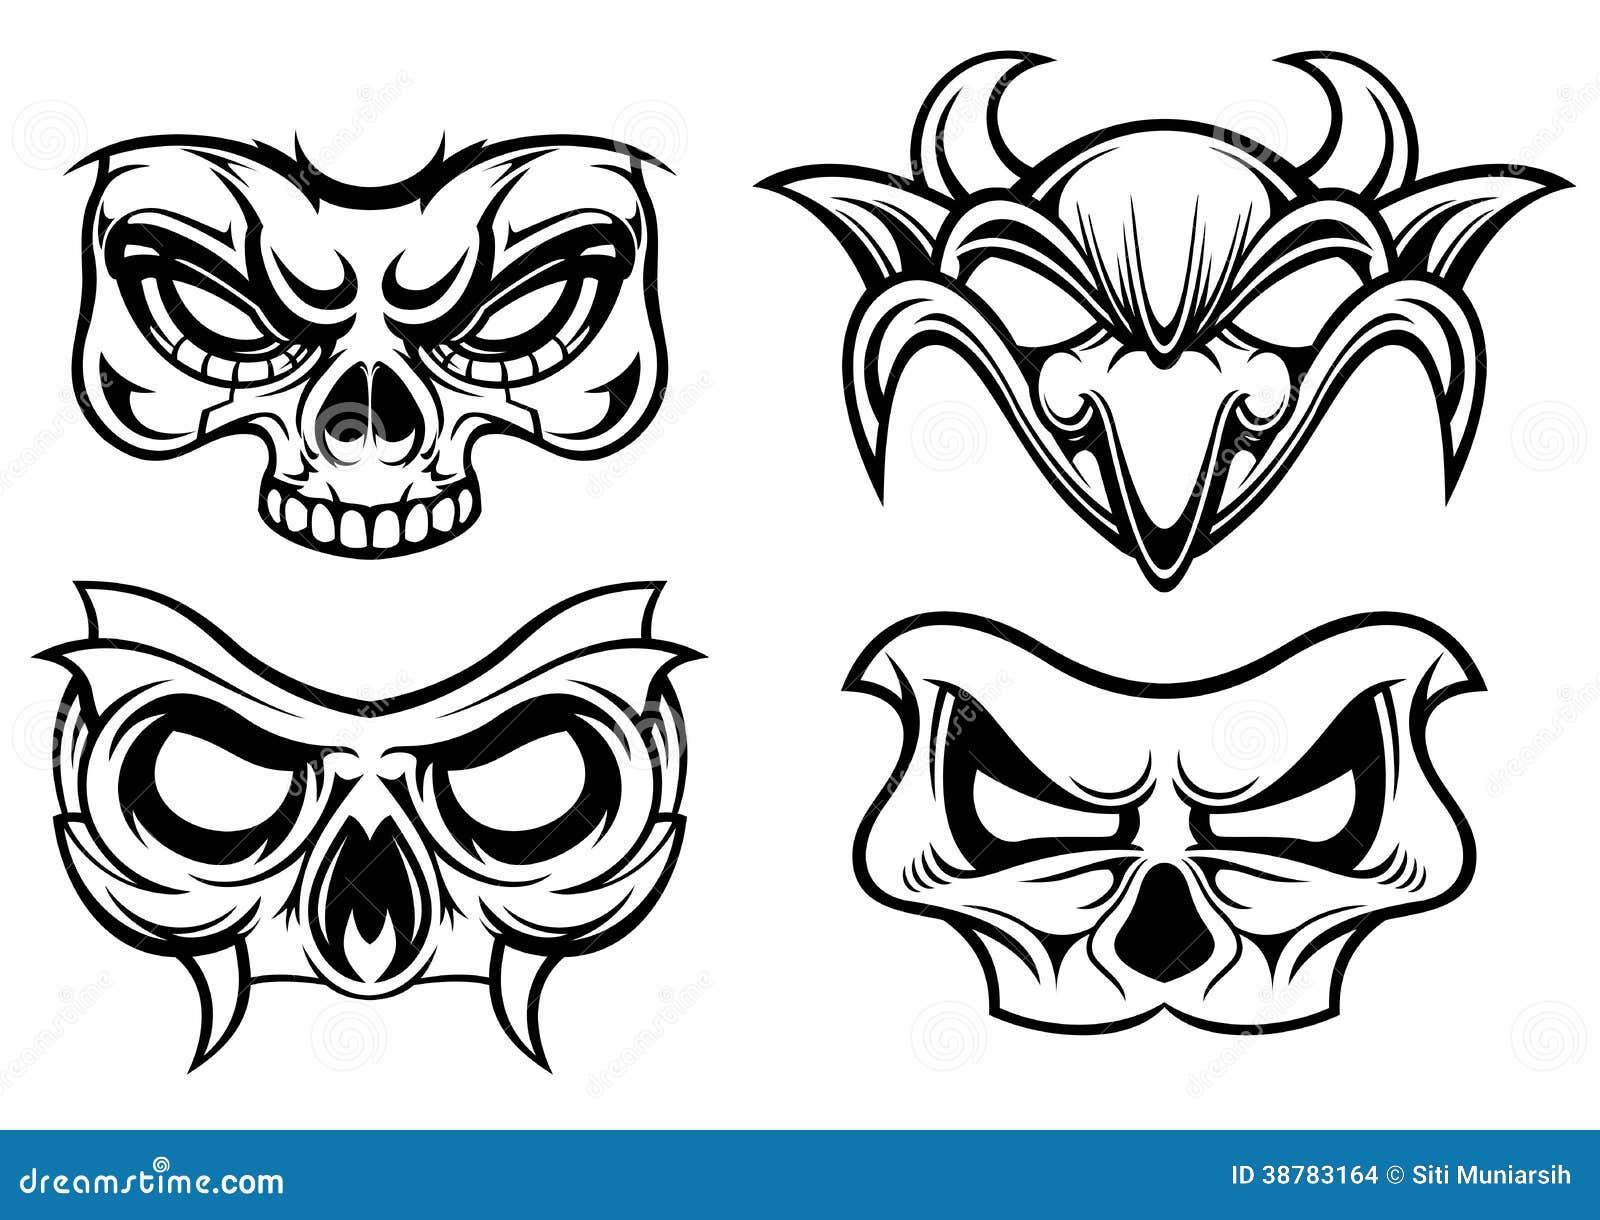 Masks Of Horror Stock Vector - Image: 38783164